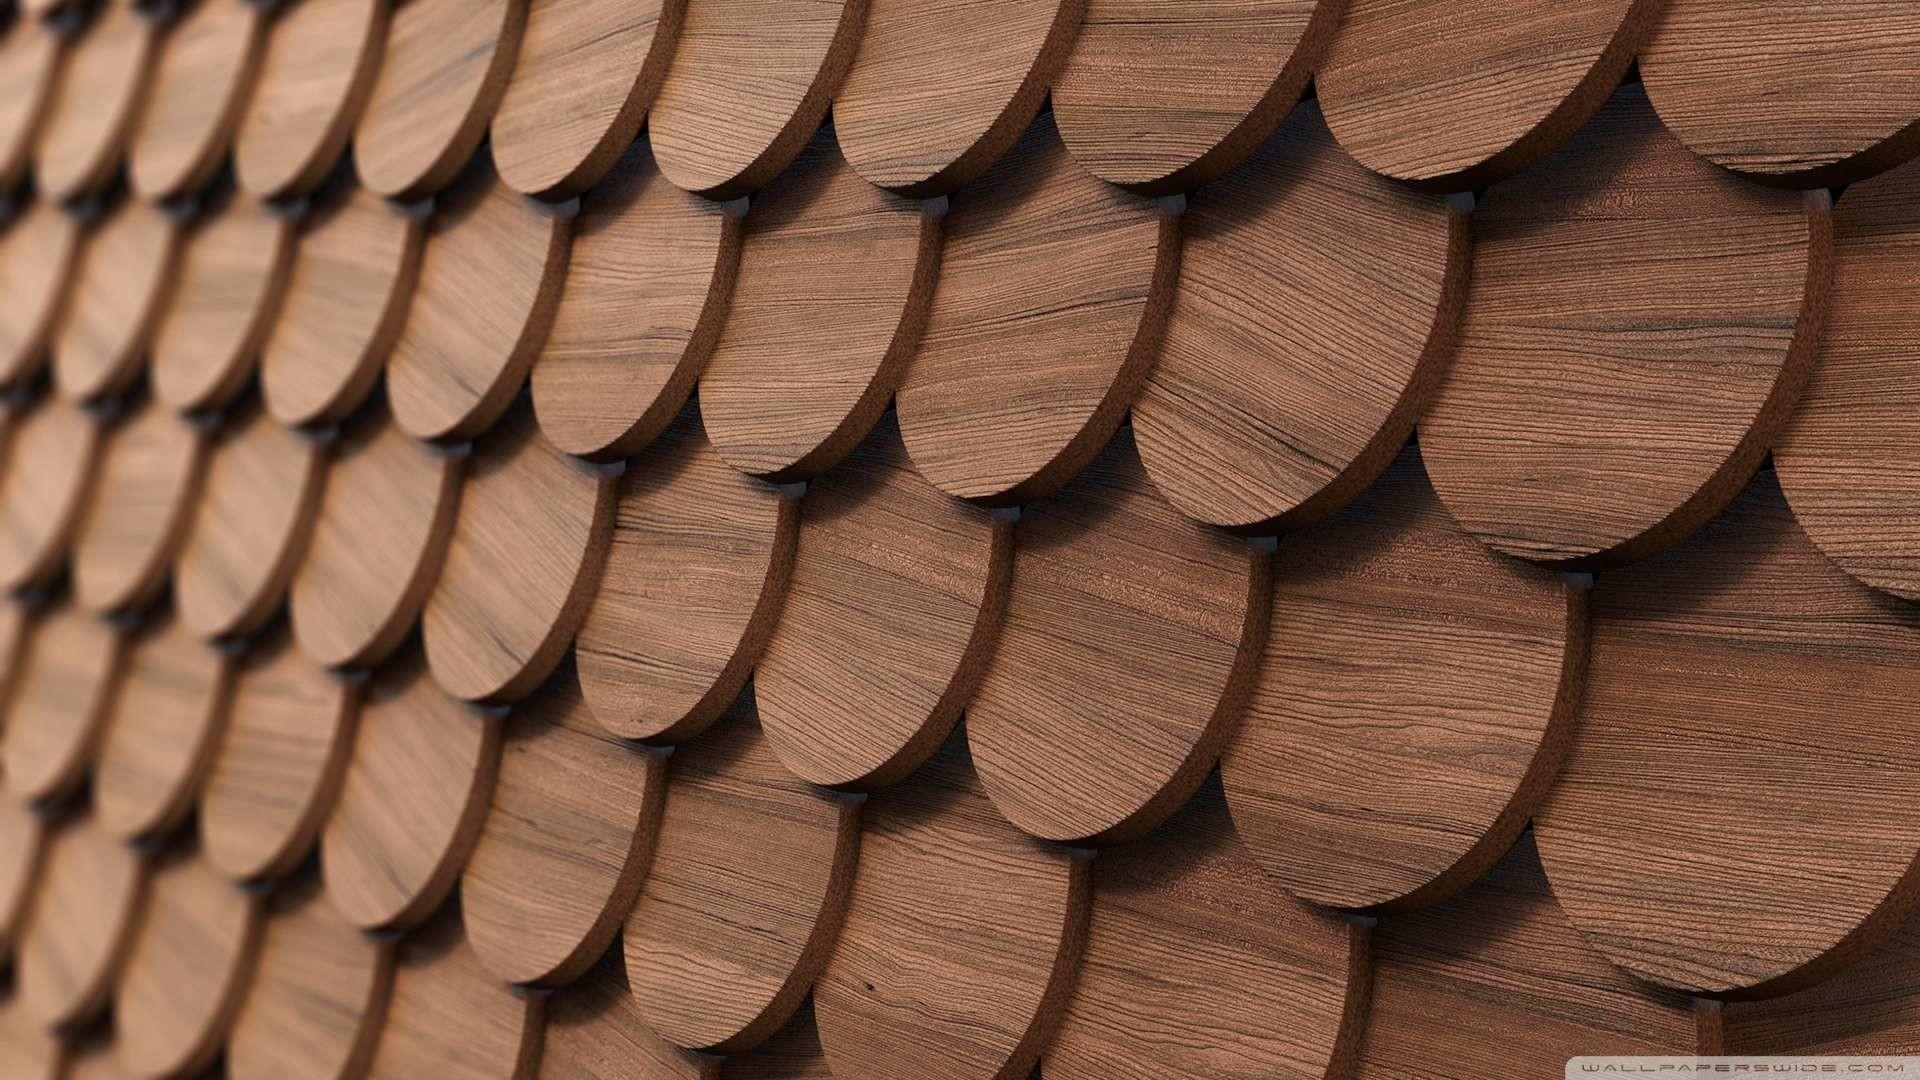 Res: 1920x1080, Wooden Shingles Wallpaper 1080p HD | HDWallWide.com